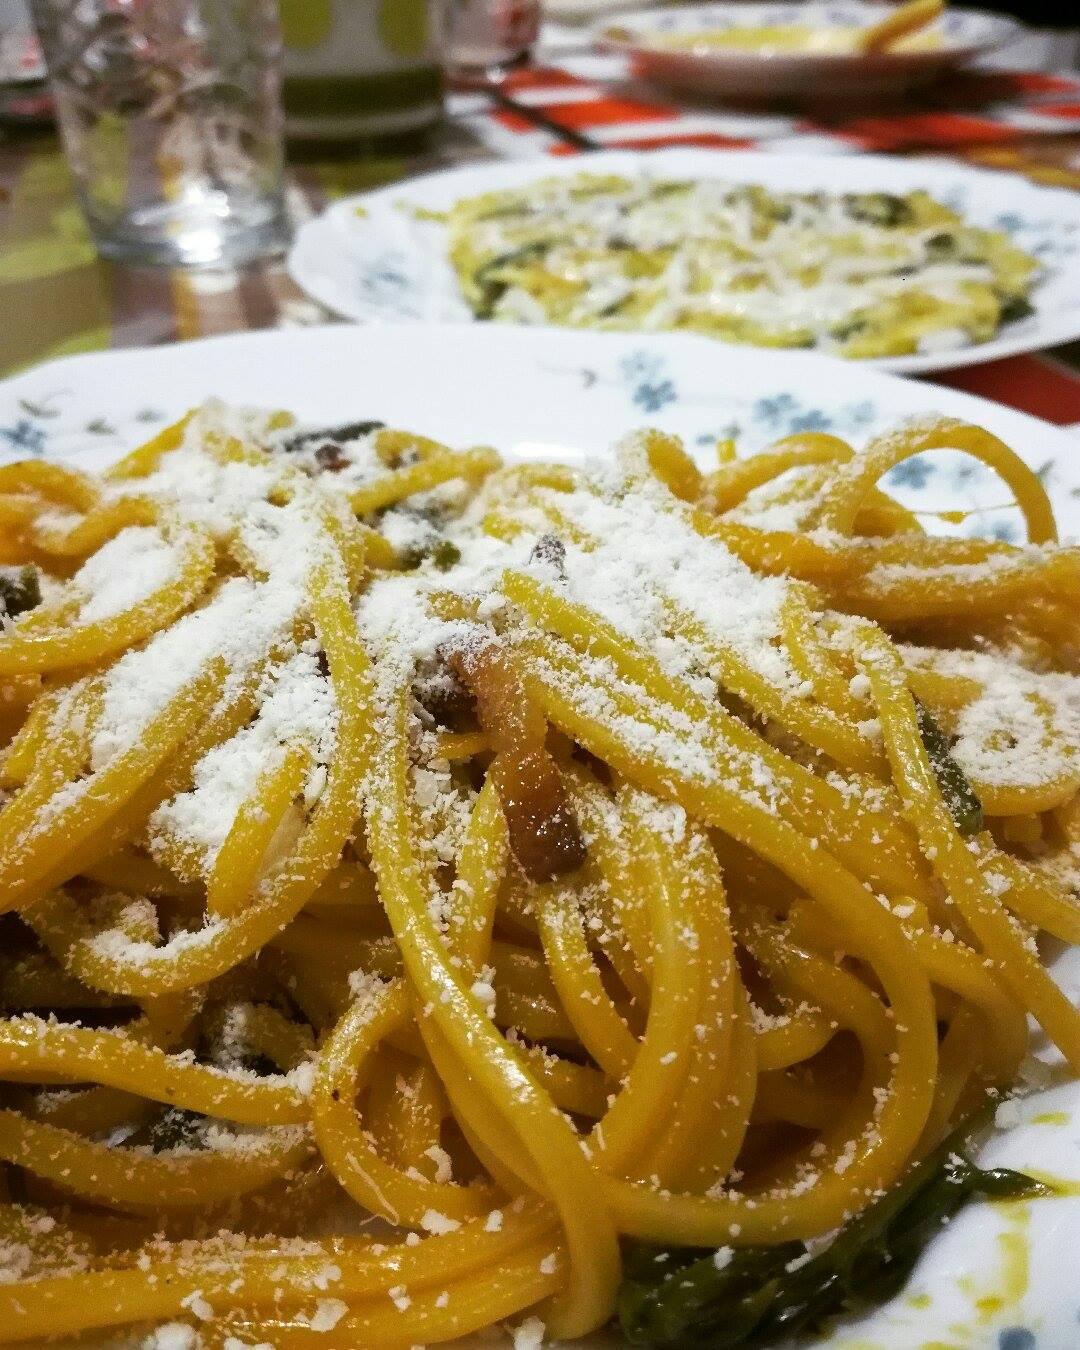 theWise in cucina: Carbonara all'asparago selvatico